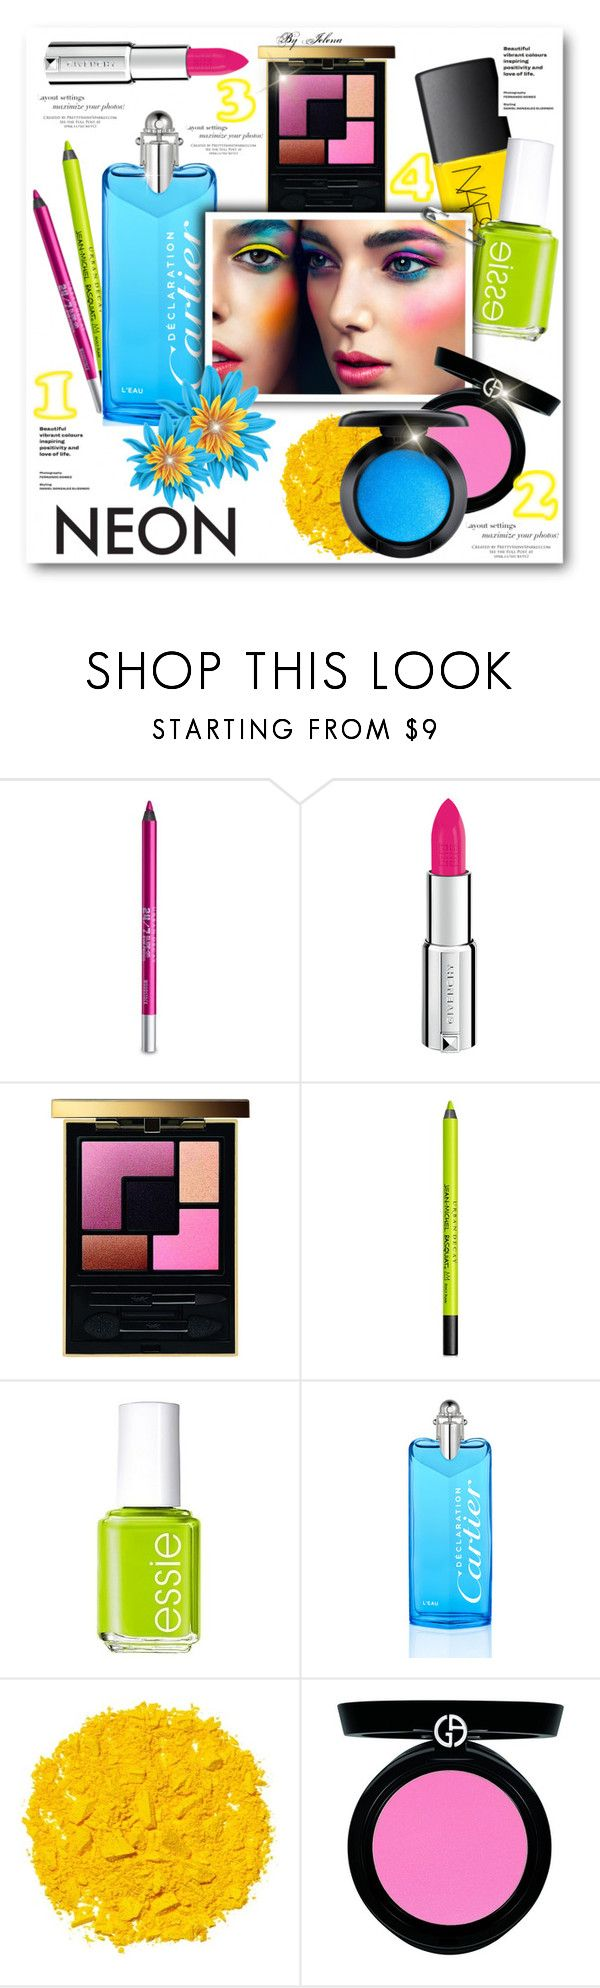 """Bright Eyes: Neon Beauty"" by jelenalazarevicpo ❤ liked on Polyvore featuring beauty, Urban Decay, Givenchy, Yves Saint Laurent, Essie, Cartier, Illamasqua, Armani Beauty and MAC Cosmetics"